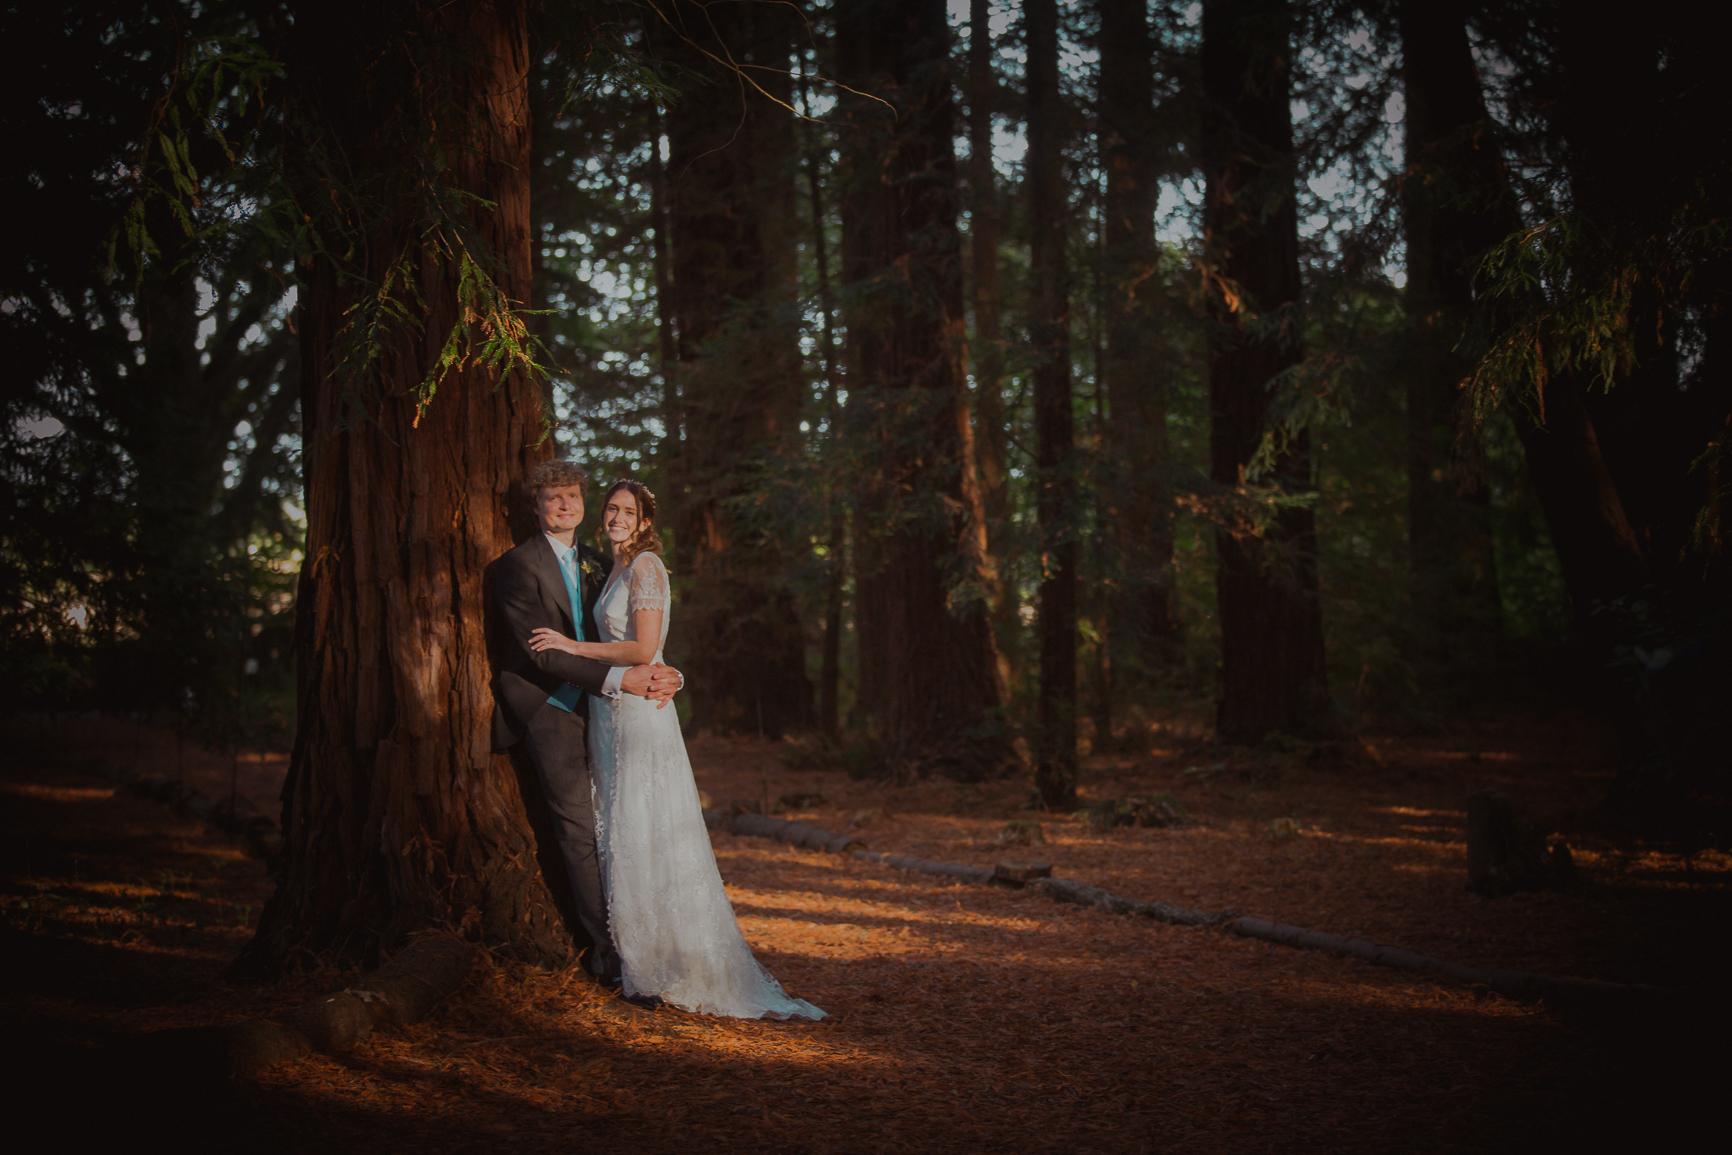 two woods wedding photographer pulborough-1.jpg